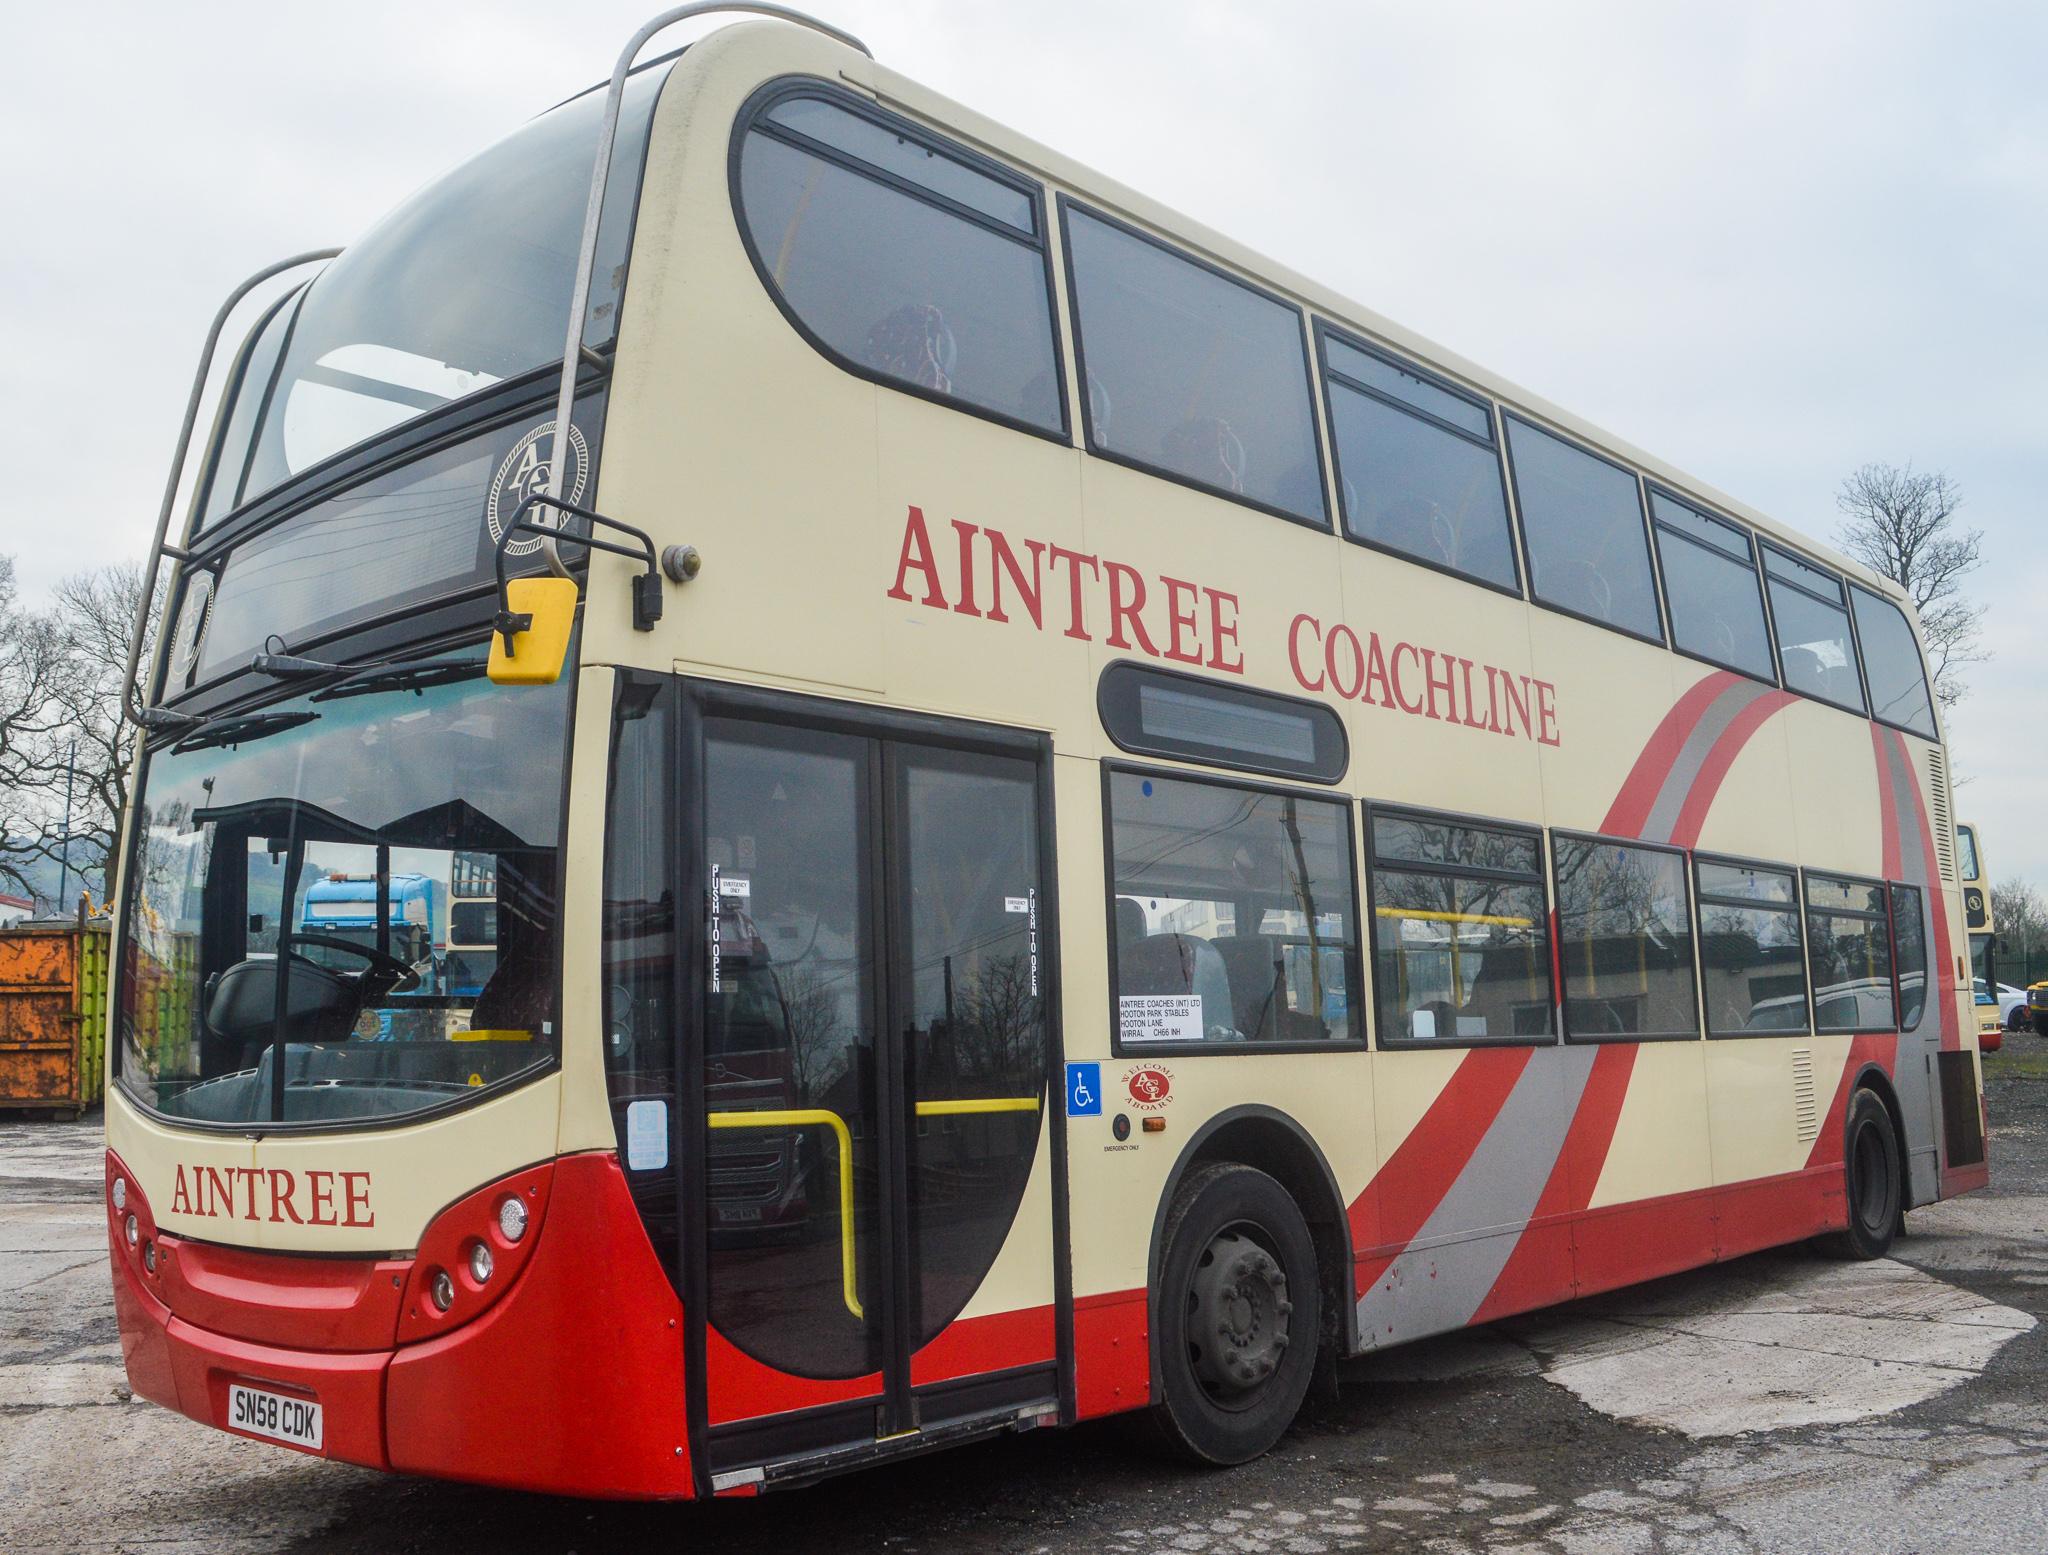 Lot 5 - Alexander Dennis Trident 2 Enviro 400 81 seat double deck service bus Registration Number: SN58